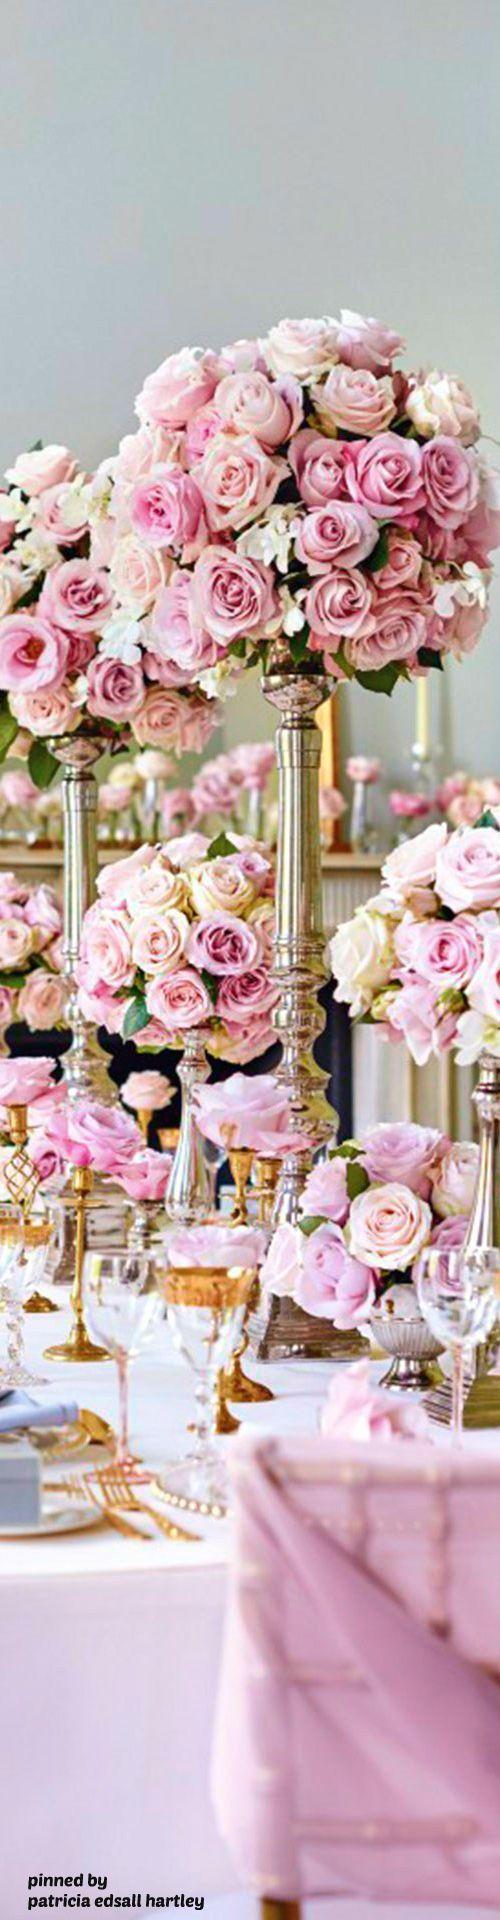 1000 images about wedding decor ideas on pinterest floral arrangements tablescapes and. Black Bedroom Furniture Sets. Home Design Ideas